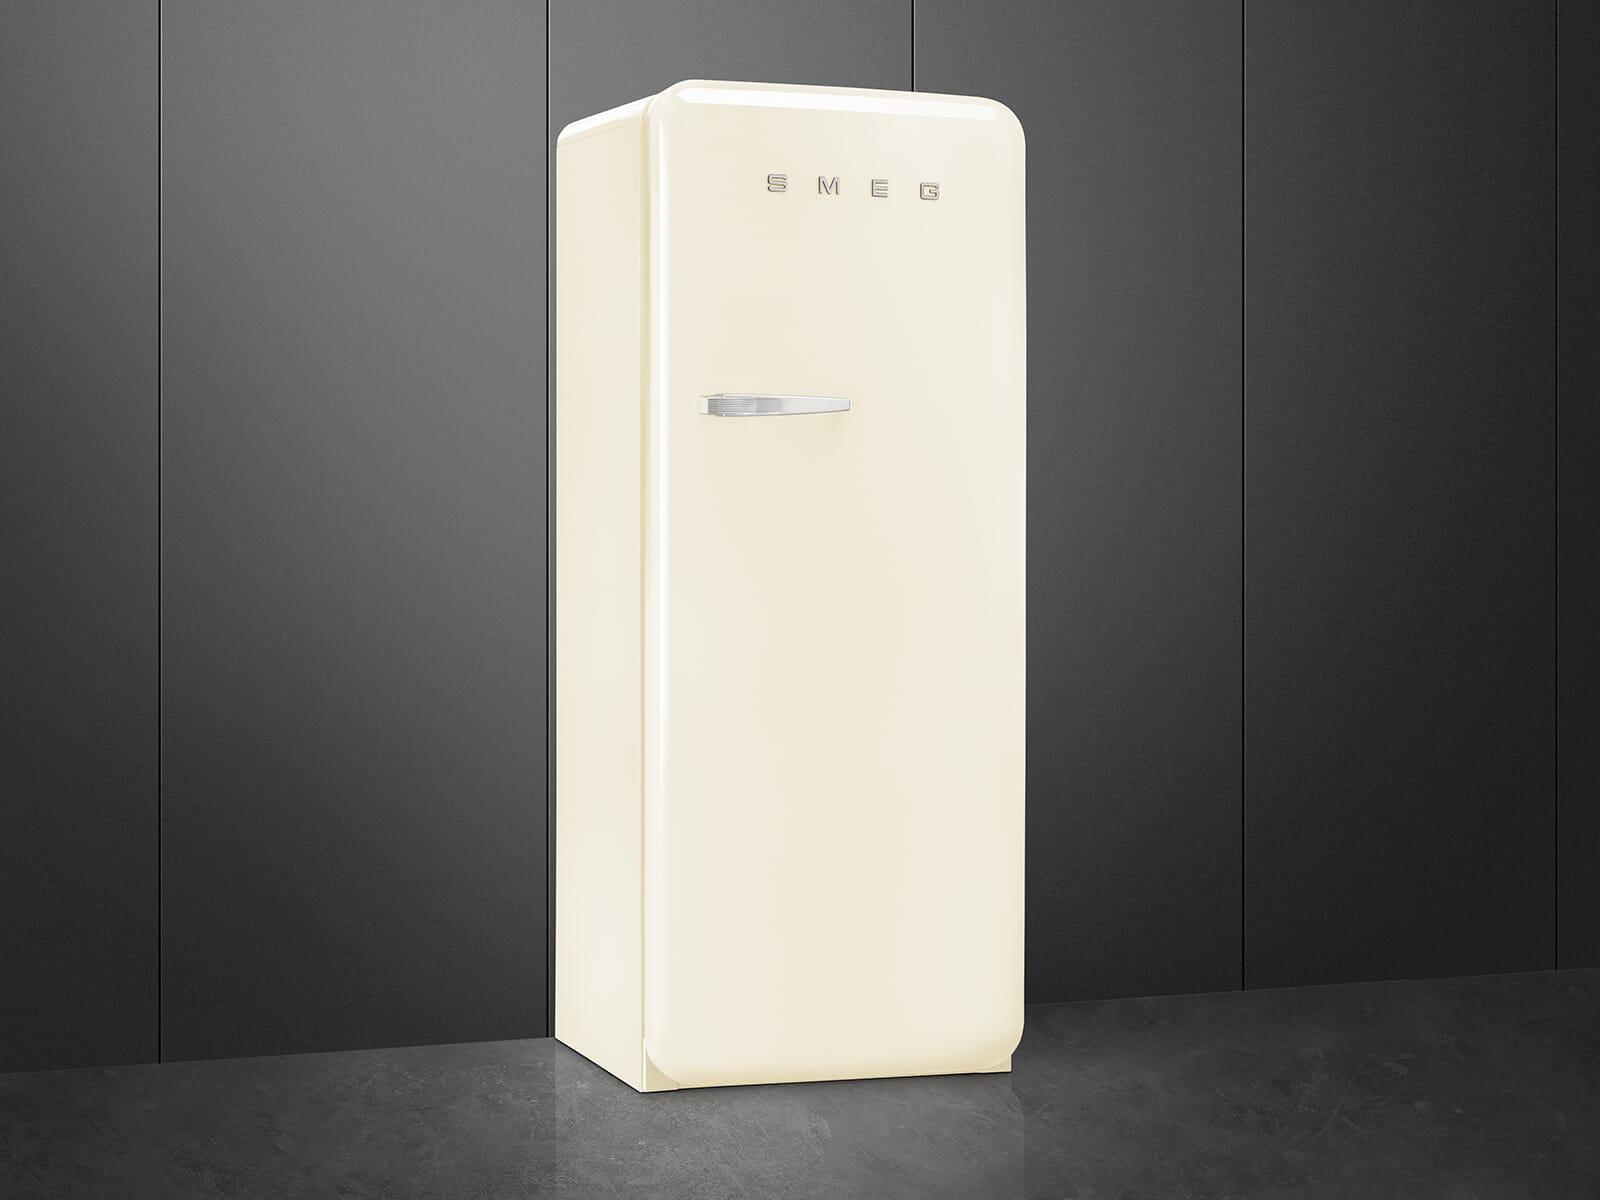 Smeg FAB28RCR3 Standkühlschrank Creme